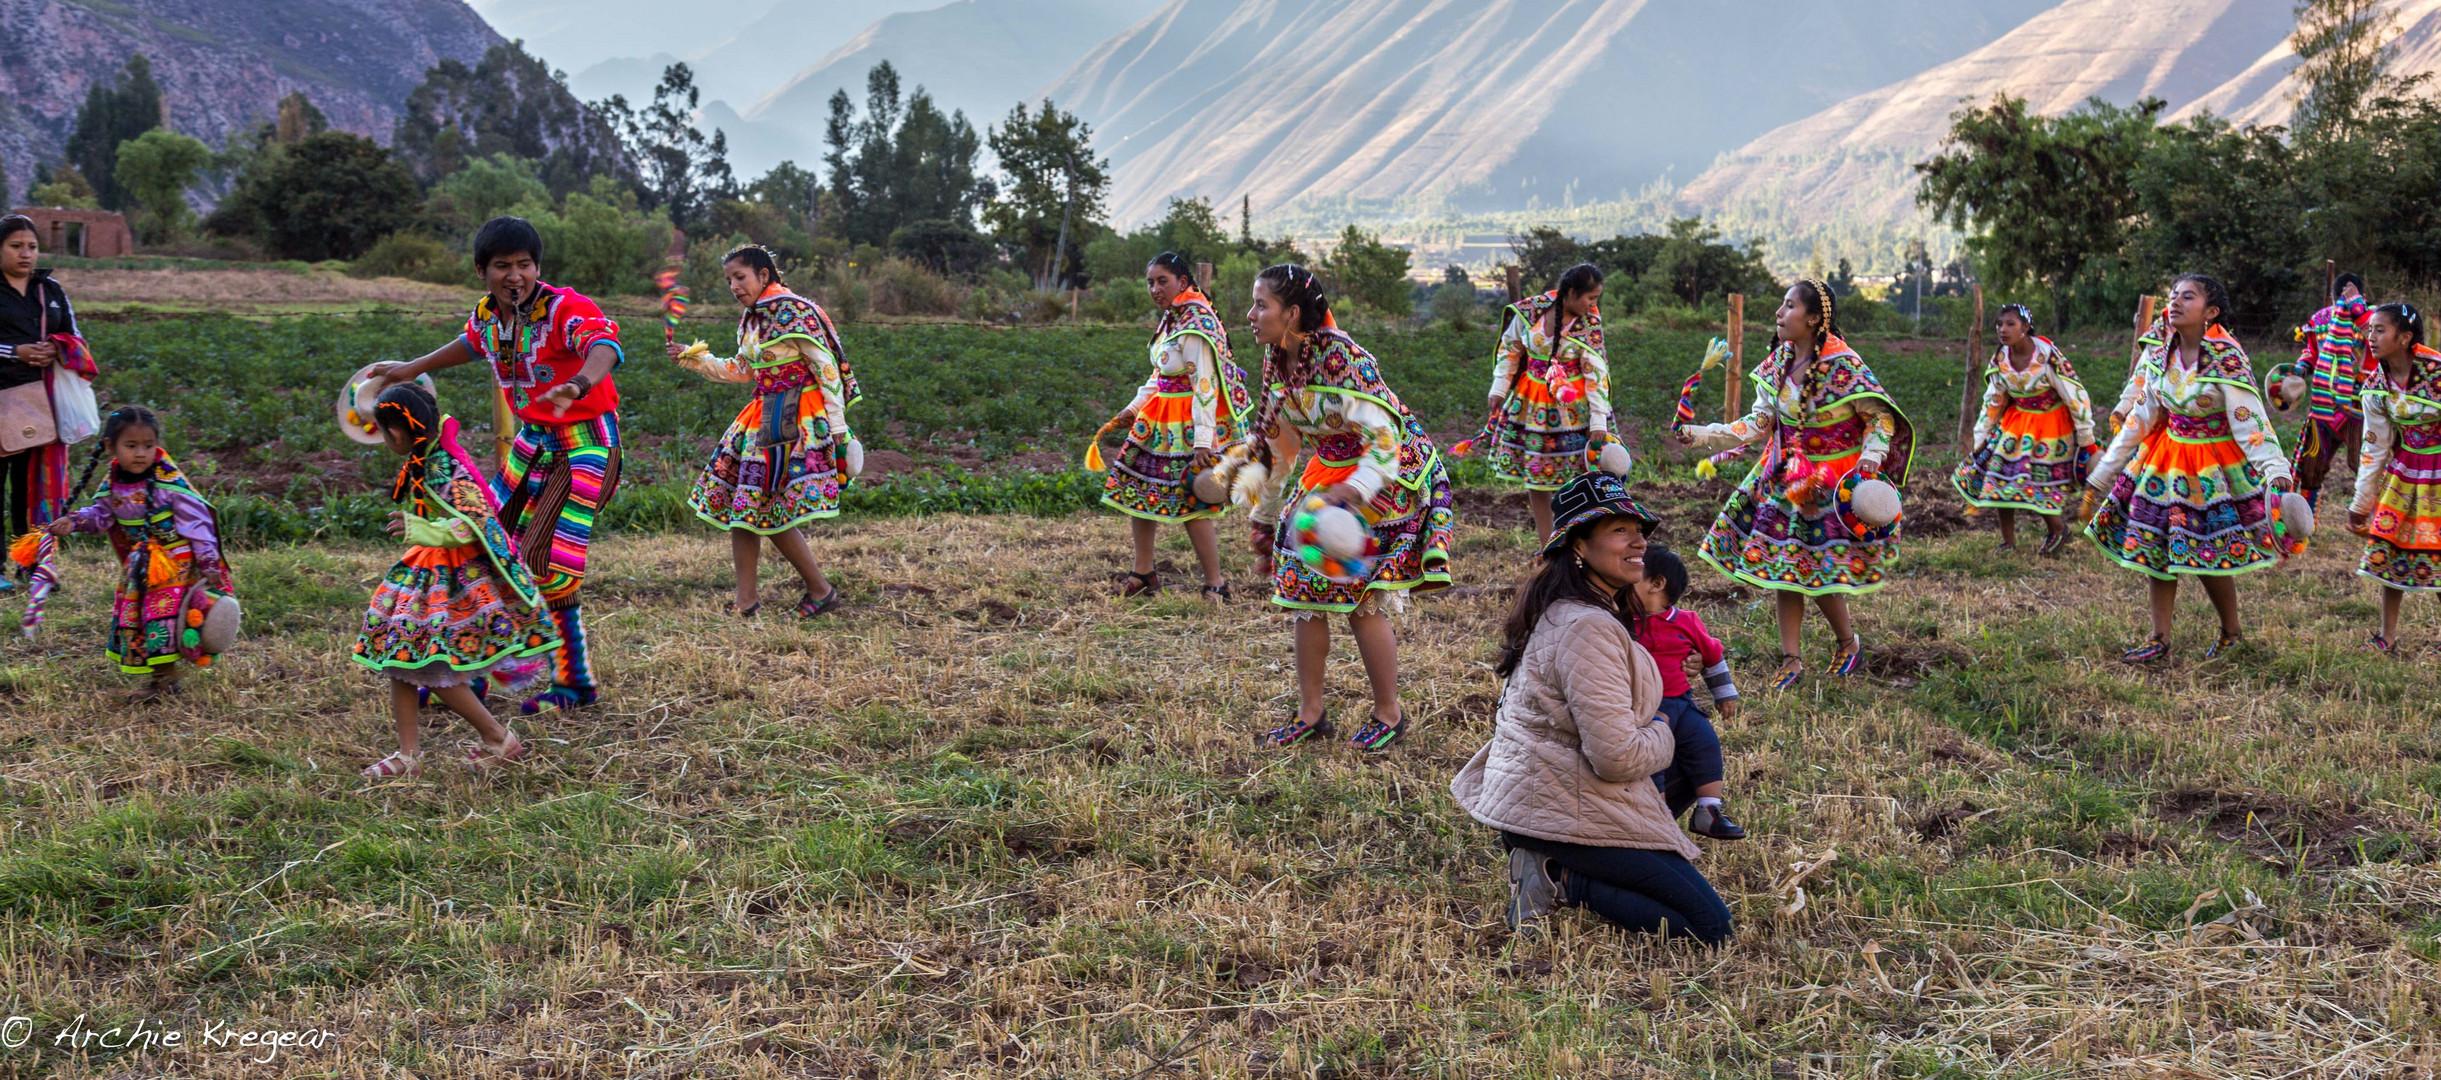 Festival of the Virgin in Huayllabamba #6